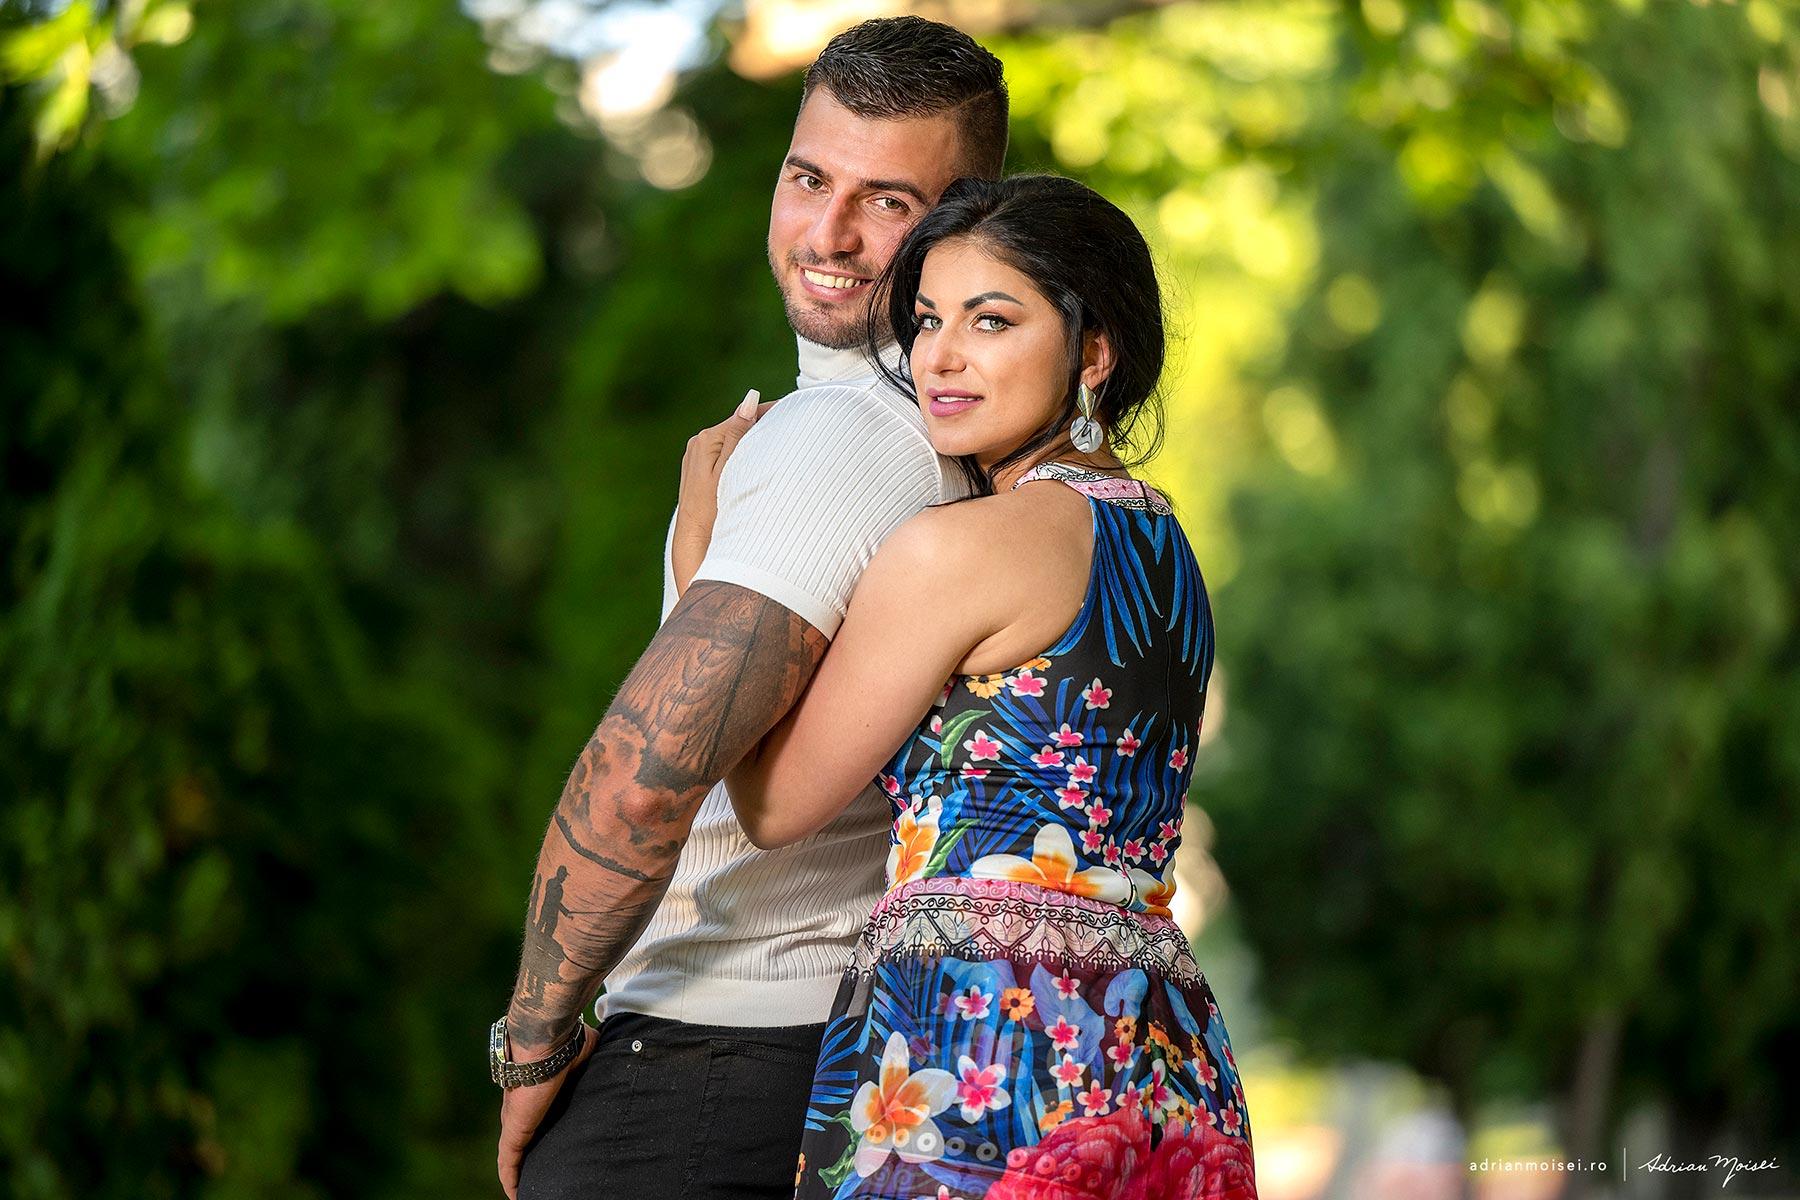 Fotograf nunta Iasi, Save the date, Studio Foto-Video Adrian Moisei